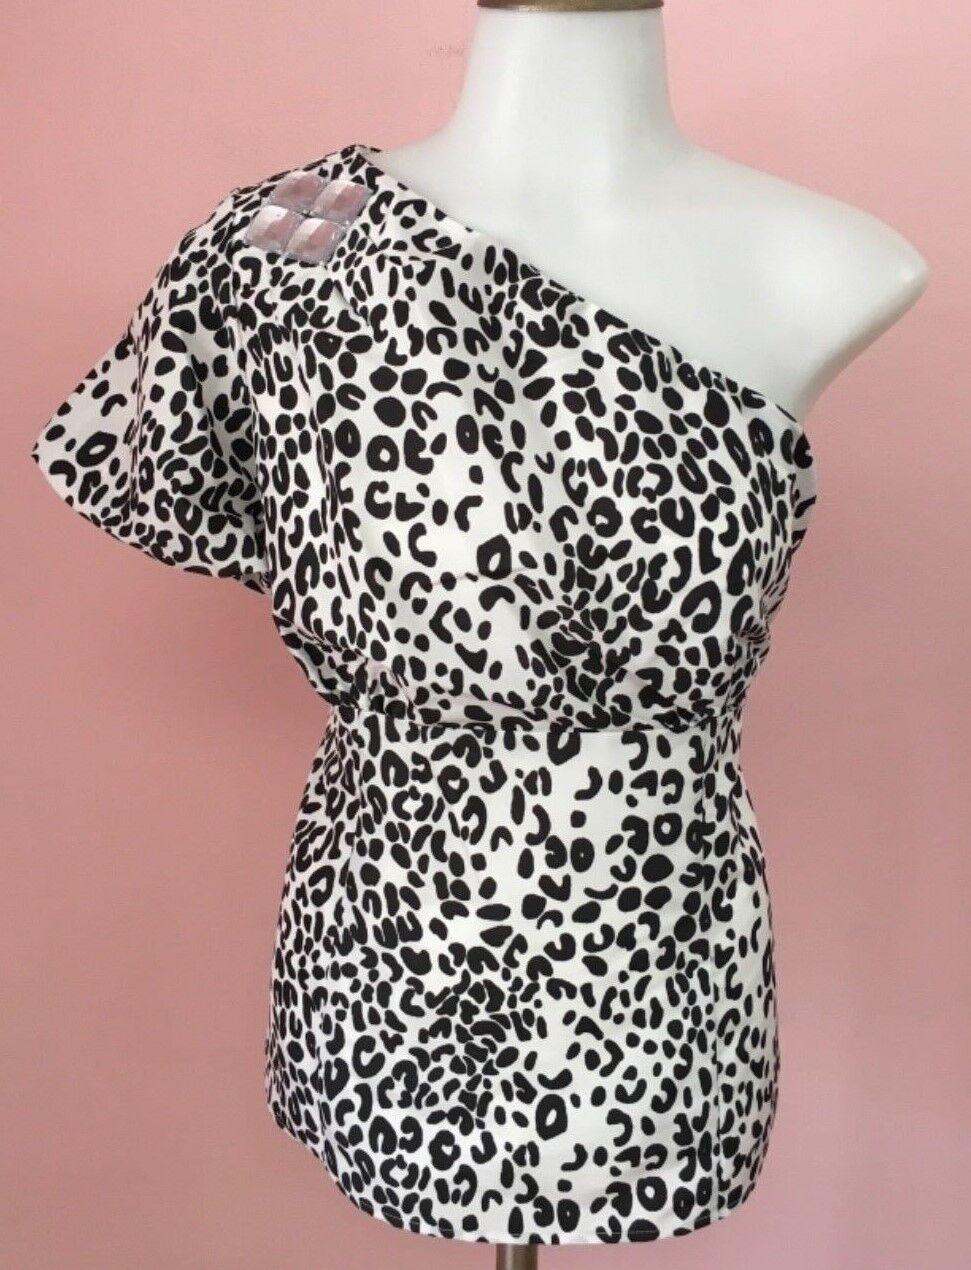 New WDNY 8 10 SEXY Weiß schwarz Asymetrical Top damen Designer Blouse Shirt NWT